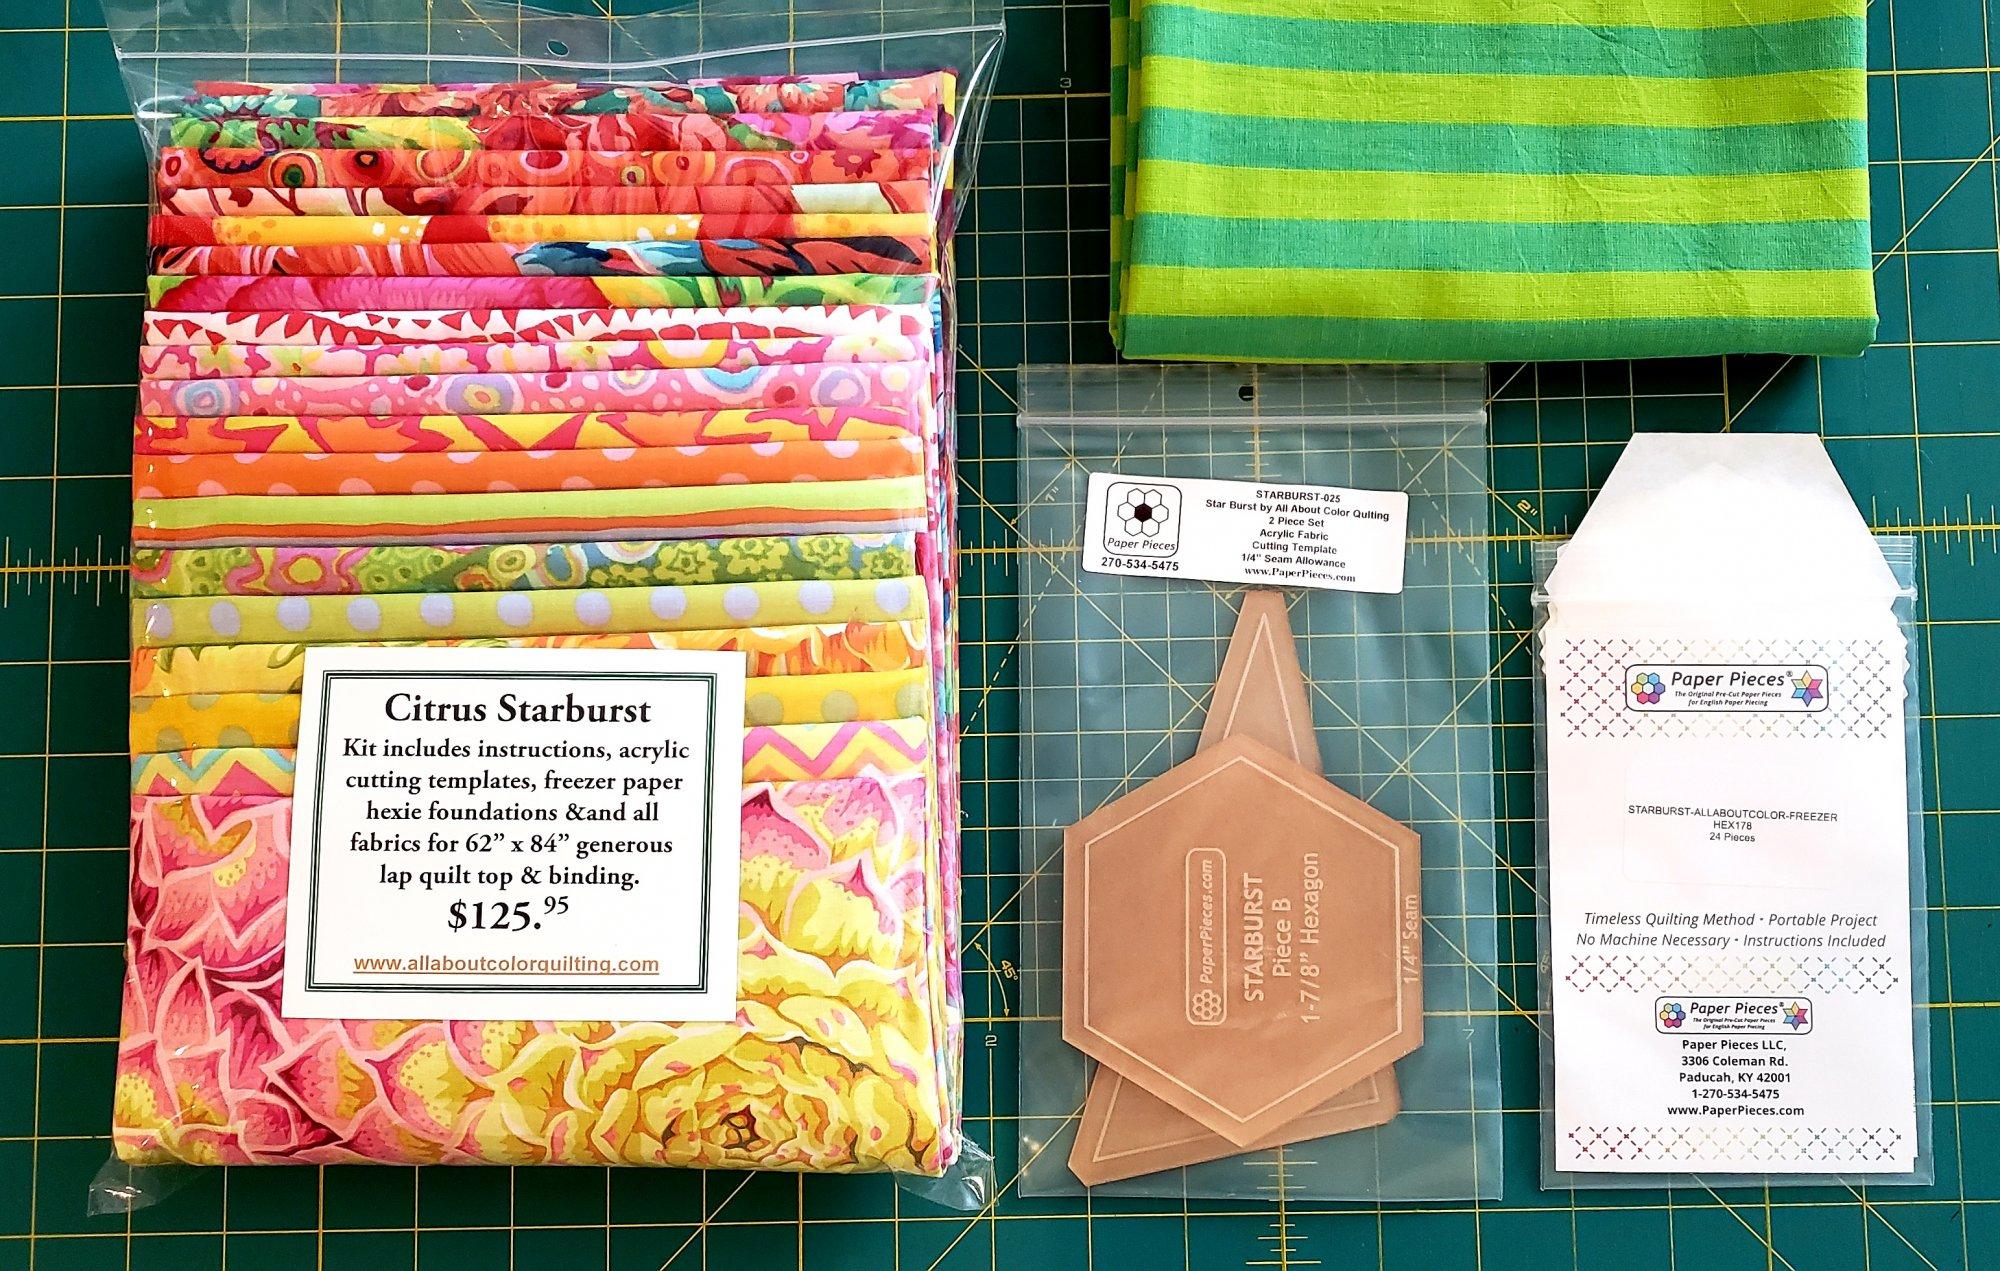 Citrus Starburst Quilt Kit